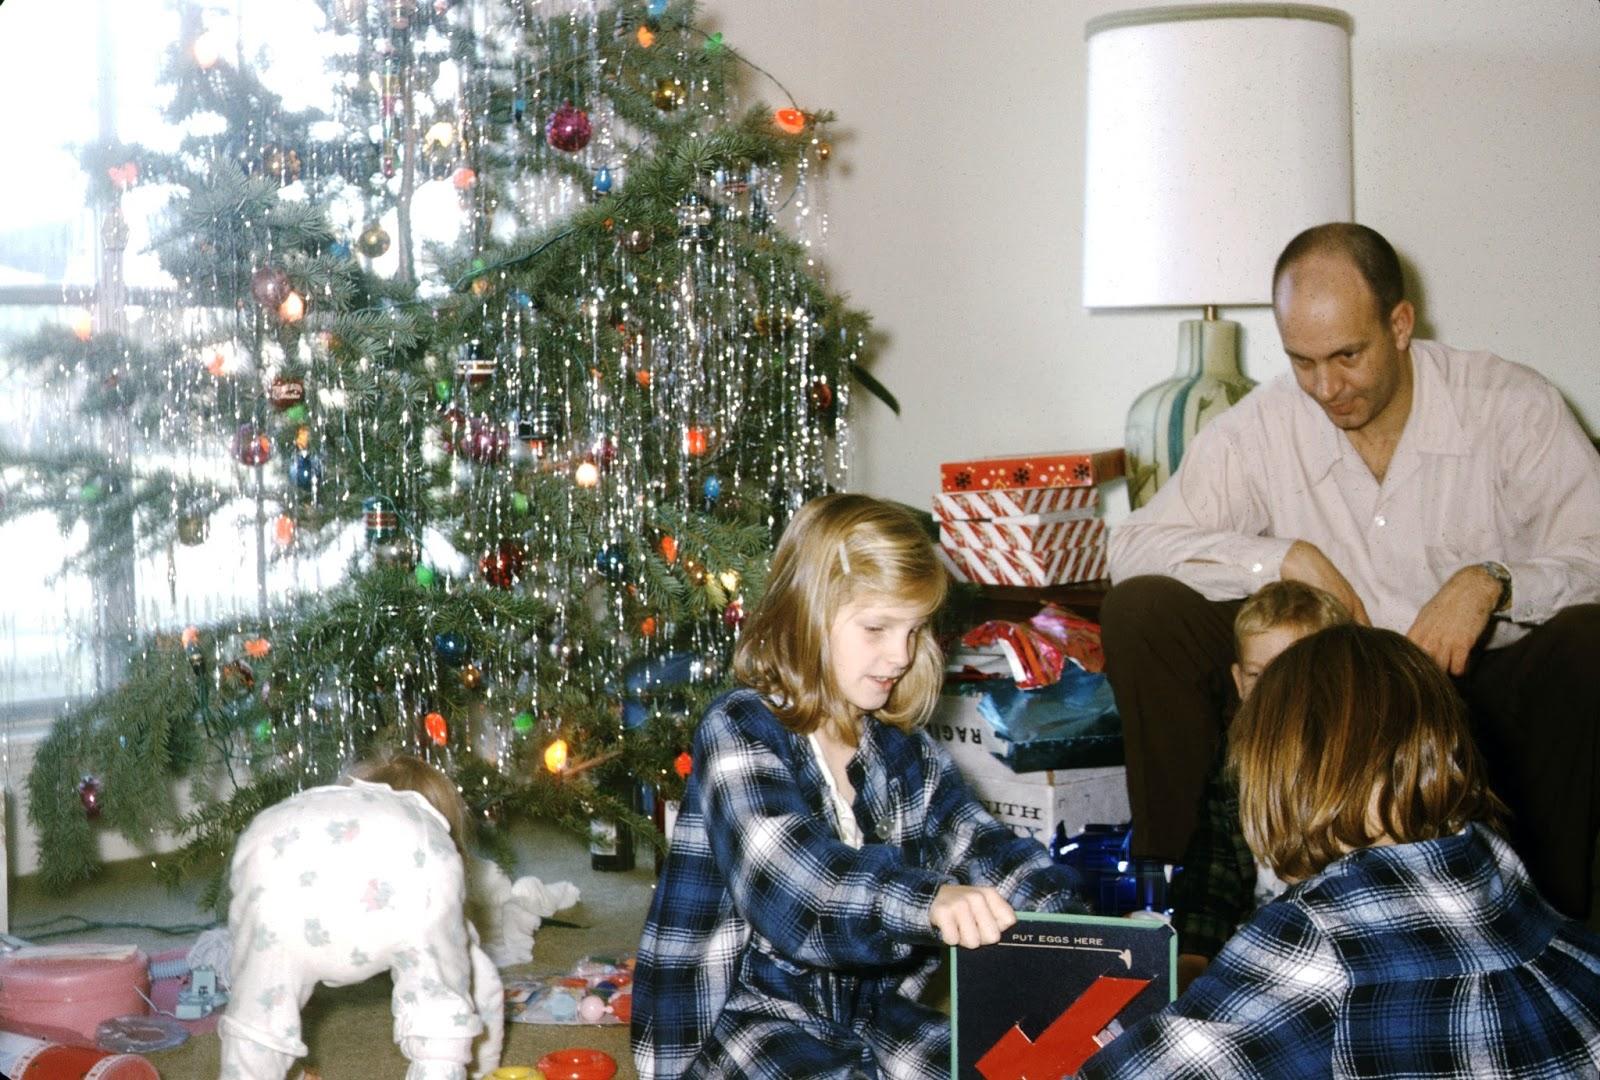 ABT UNK Sentimental Sunday Merry Christmas 1965